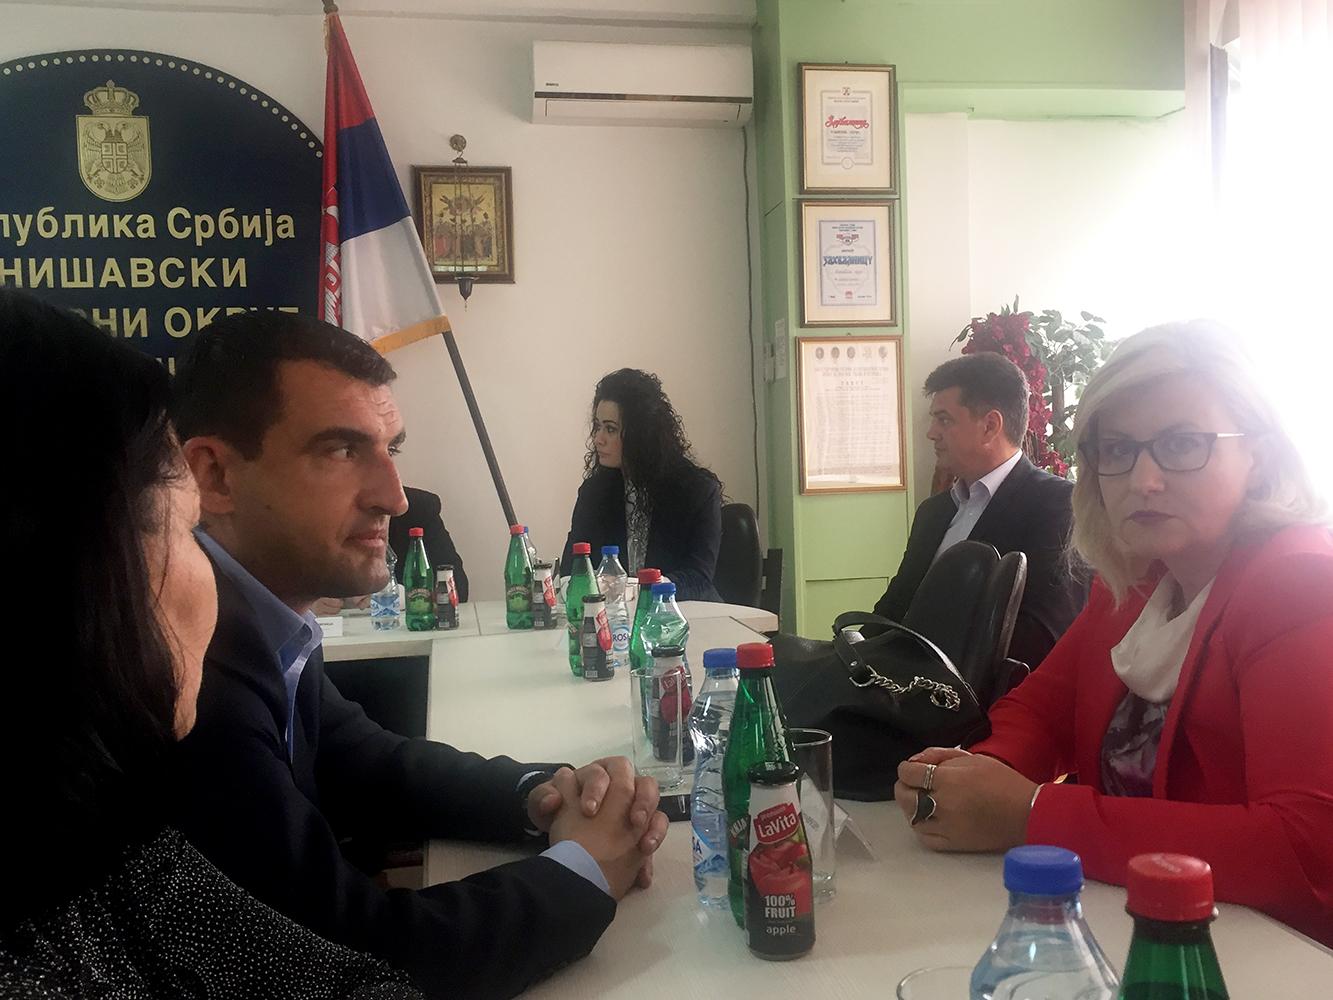 Rumunska delegacija u Nišavskom upravnom okrugu